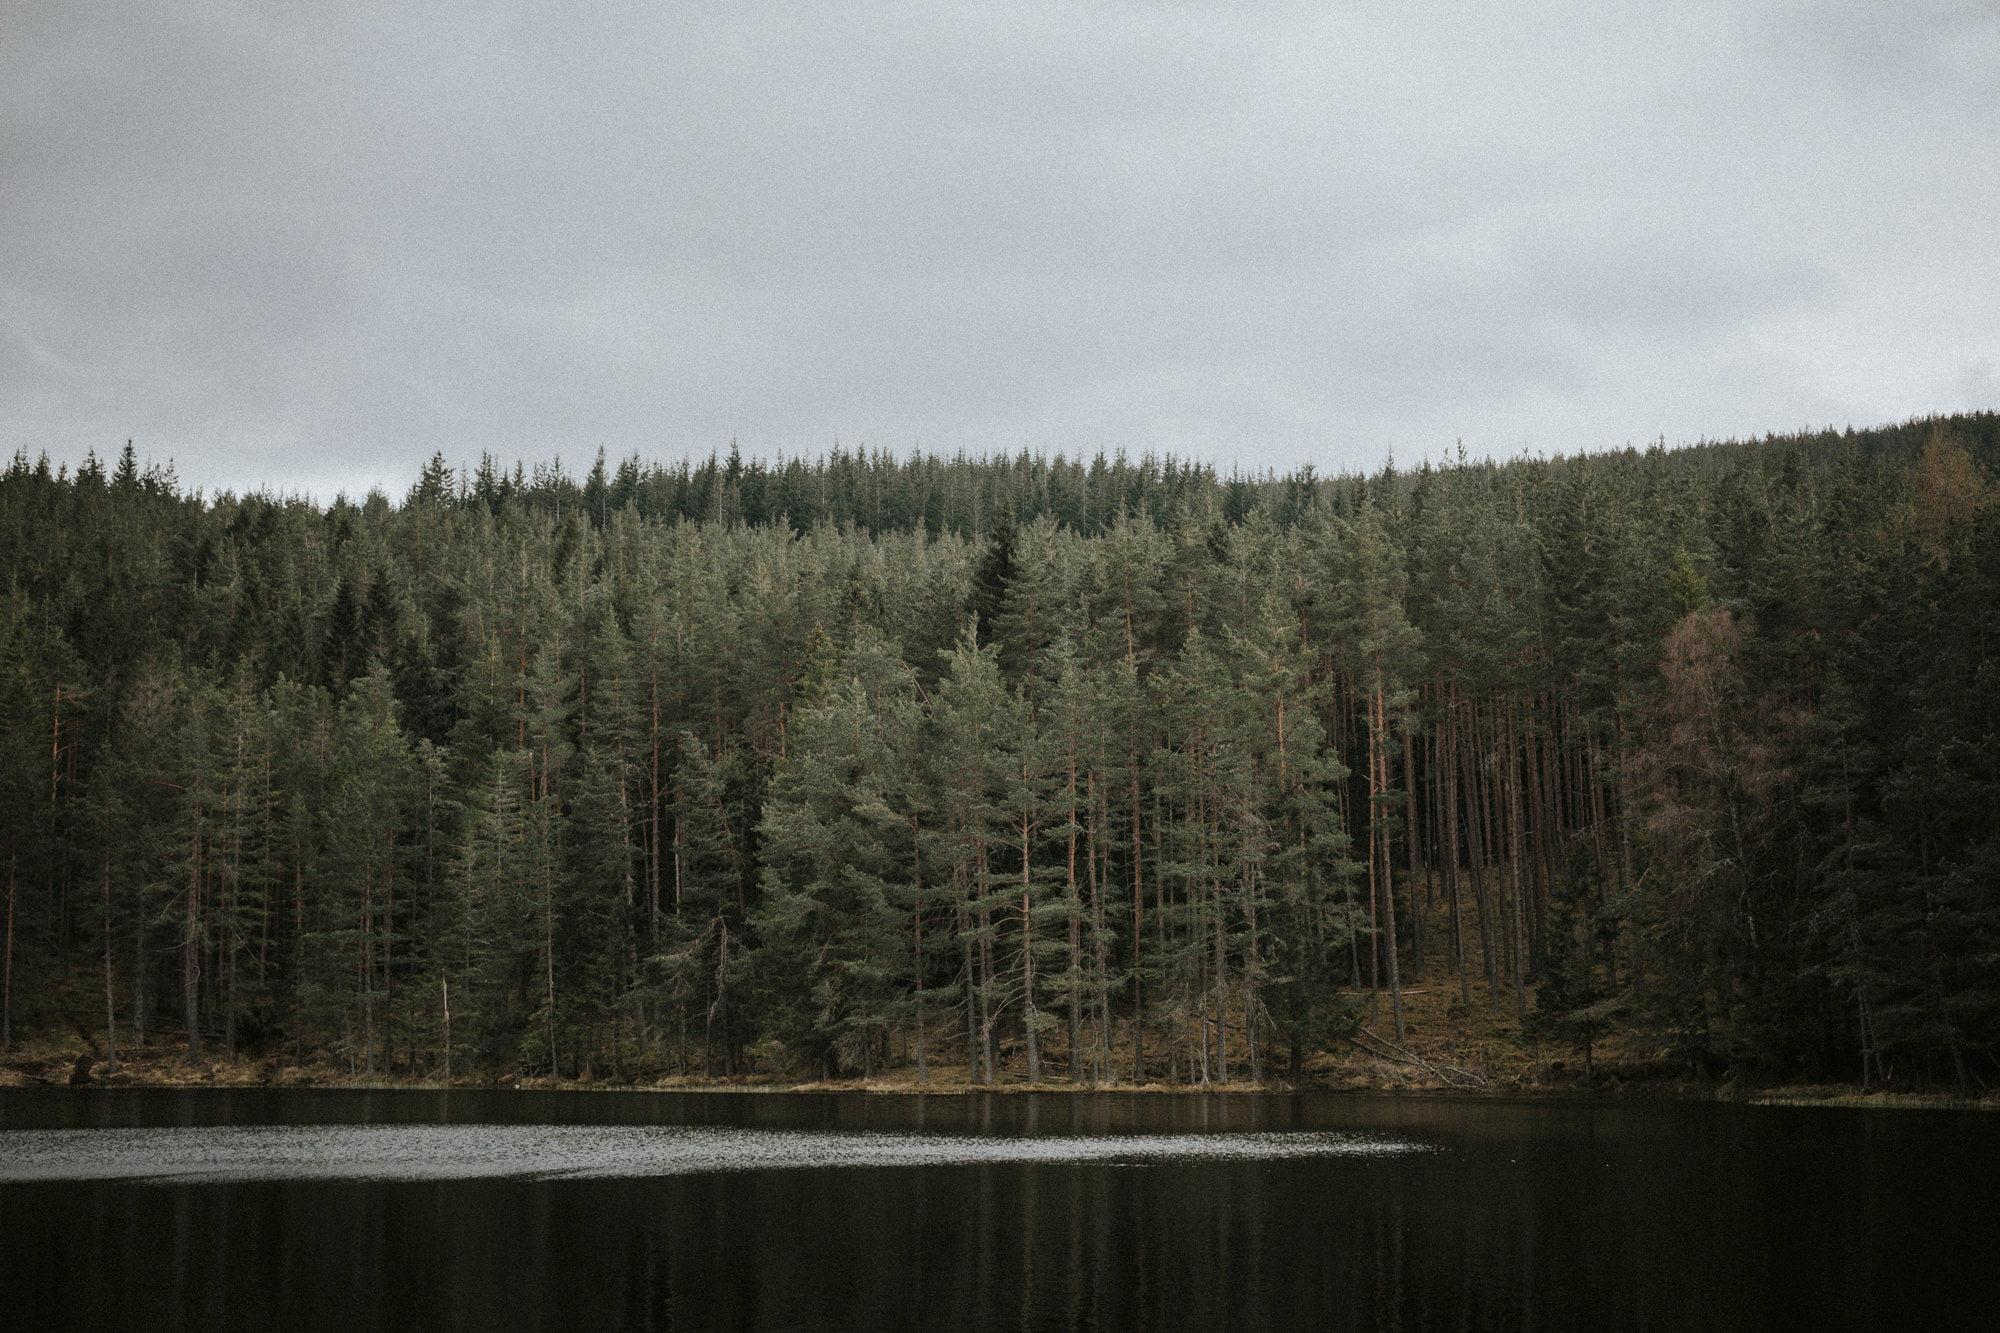 Loch Ullachie elopement, Aviemore elopement, Cairngorms elopement in the Scottish Highlands Lochs